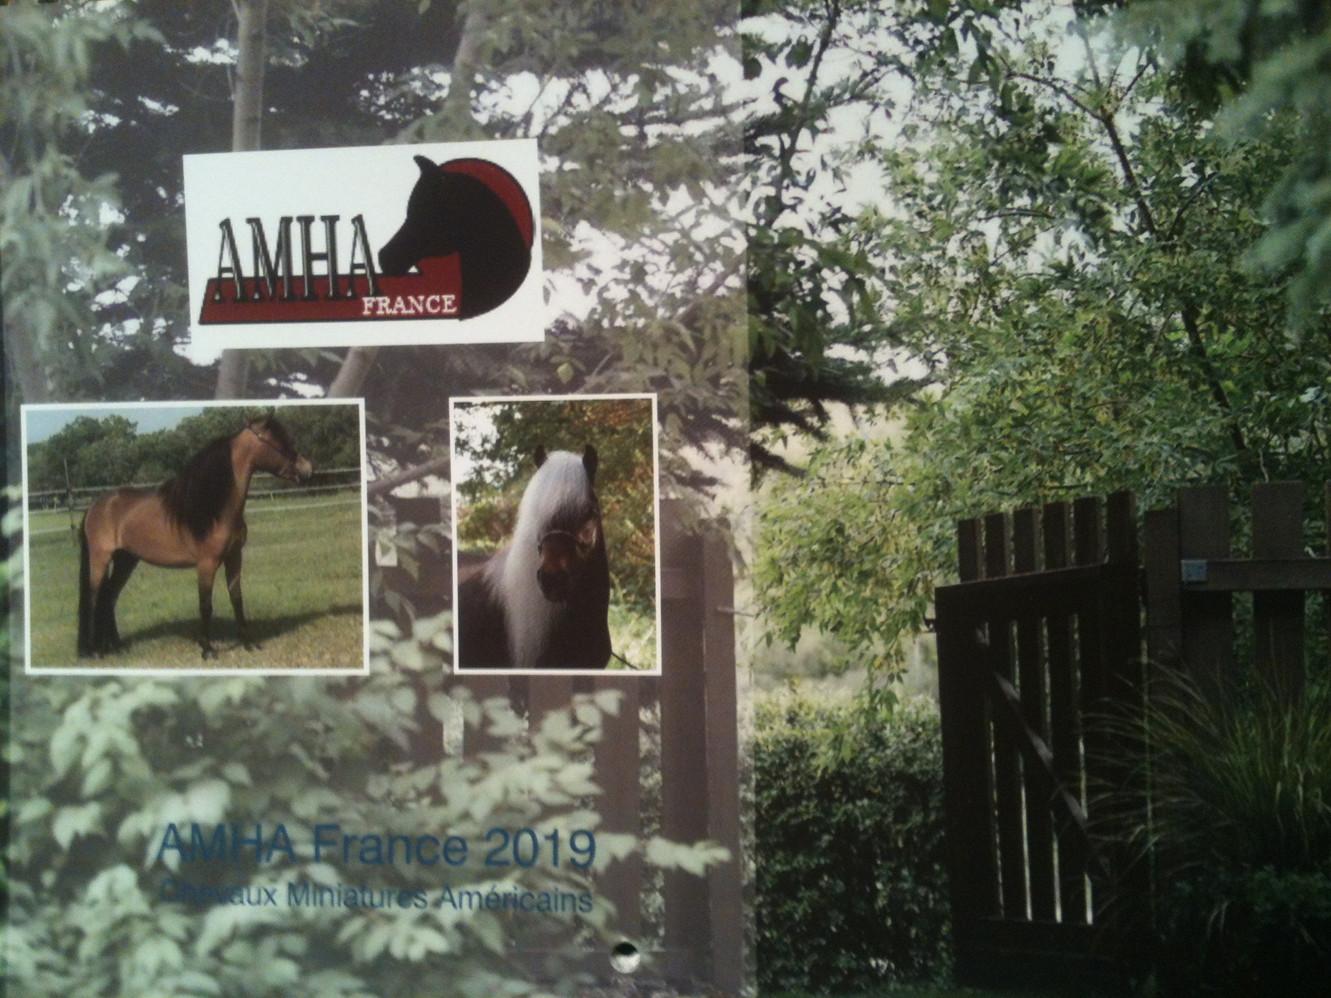 Calendriers AMHA France 2019